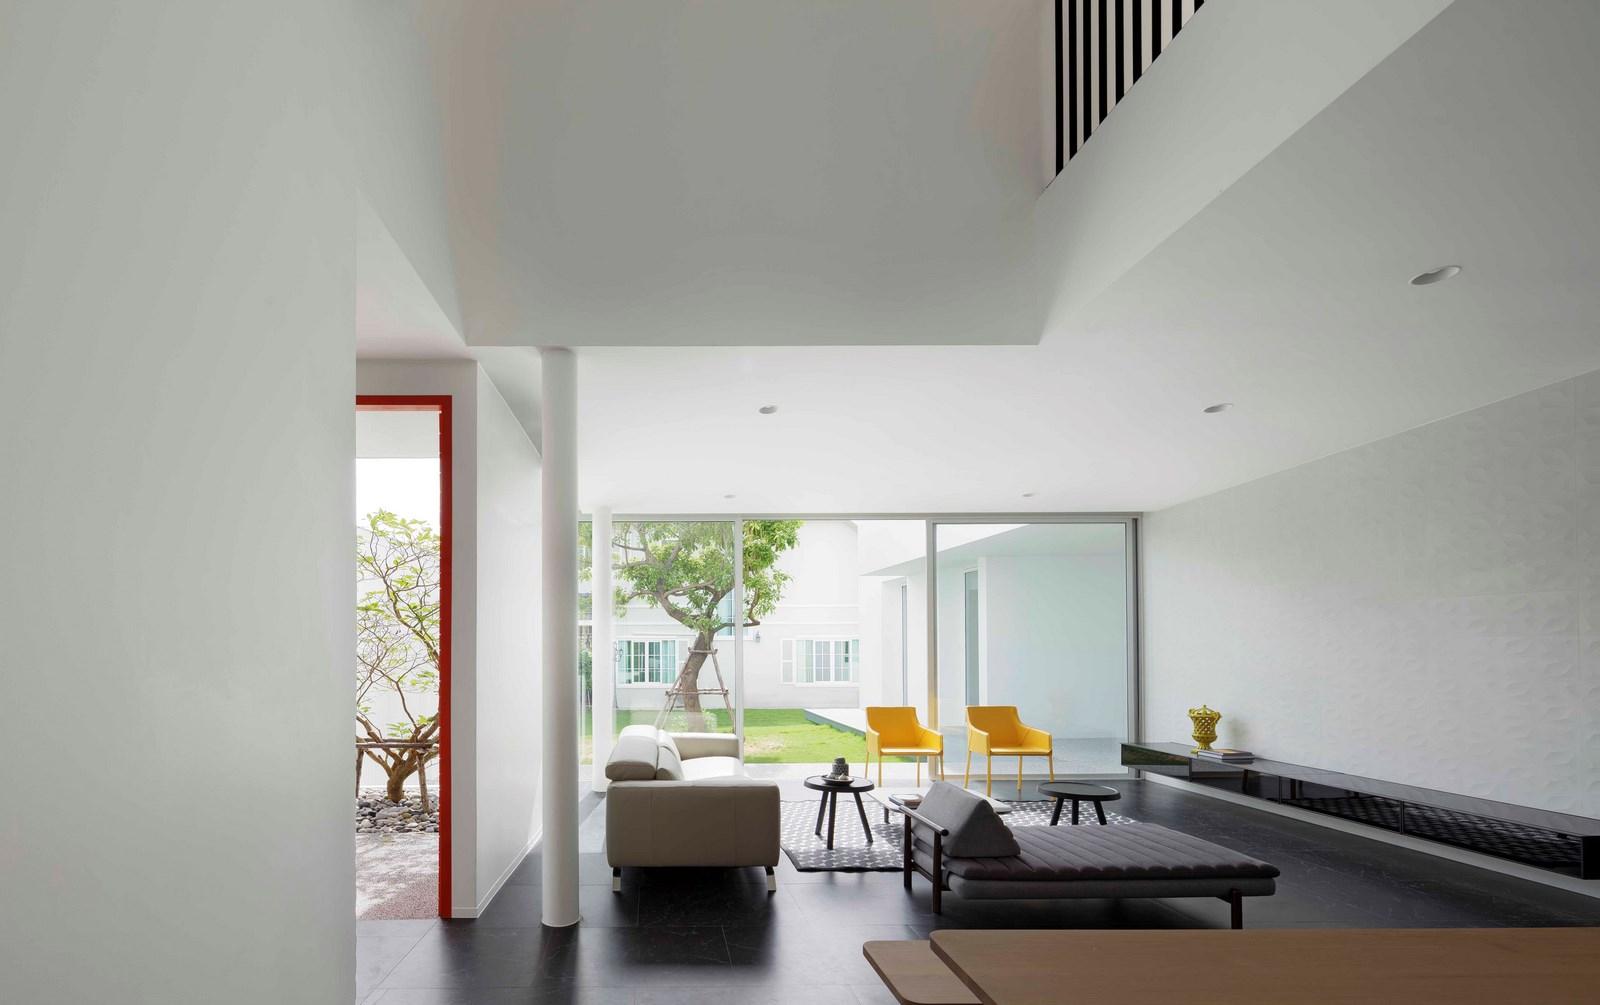 INT_Living area 03 (Copy)